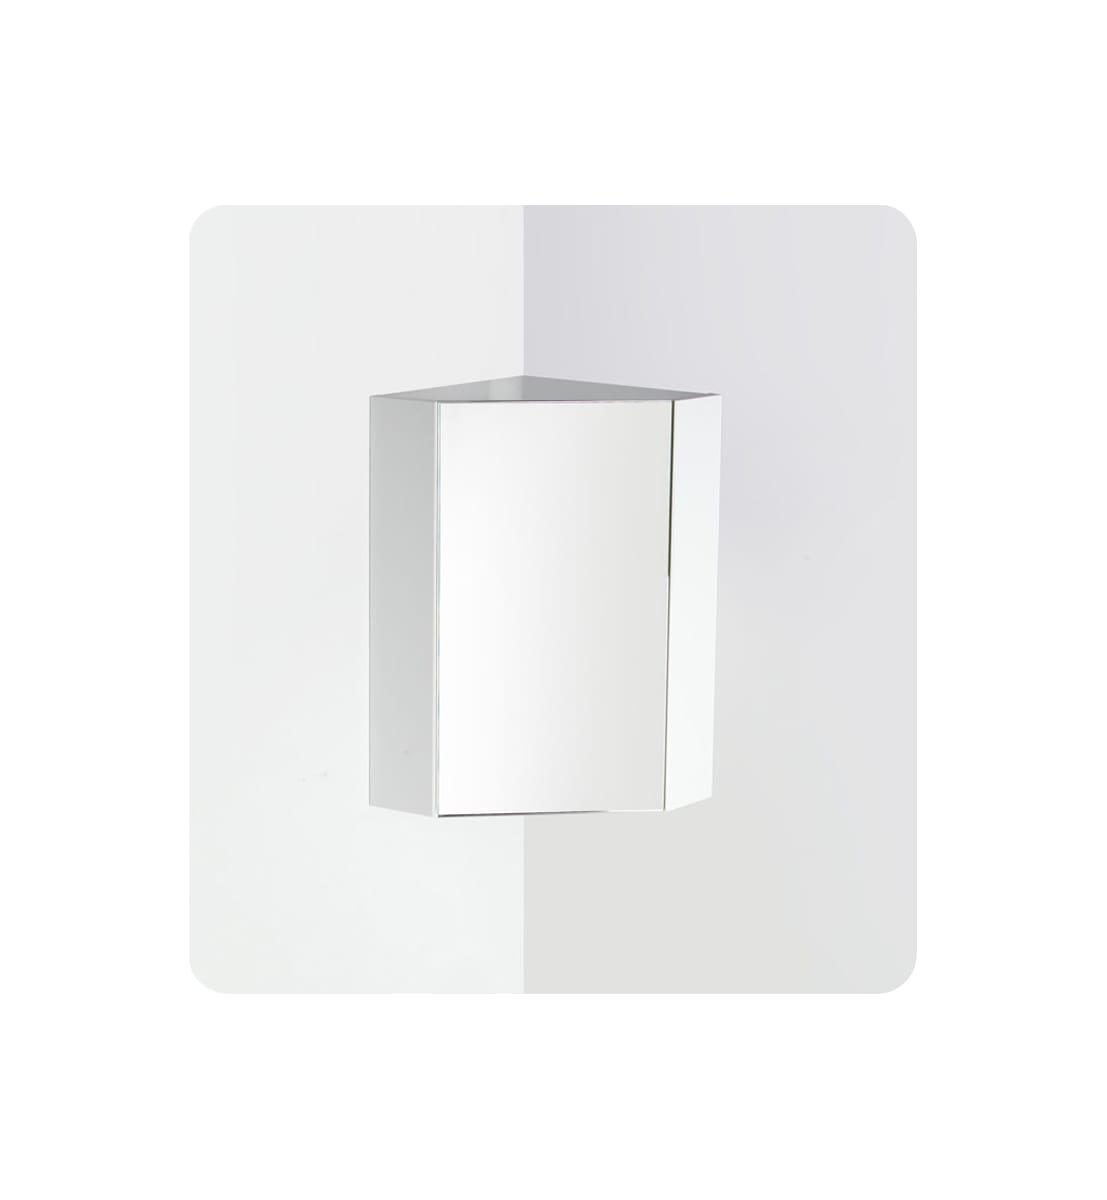 Fresca Fmc5084wh White 18 Single Door Framed Corner Medicine Cabinet With Two Shelves Faucet Com